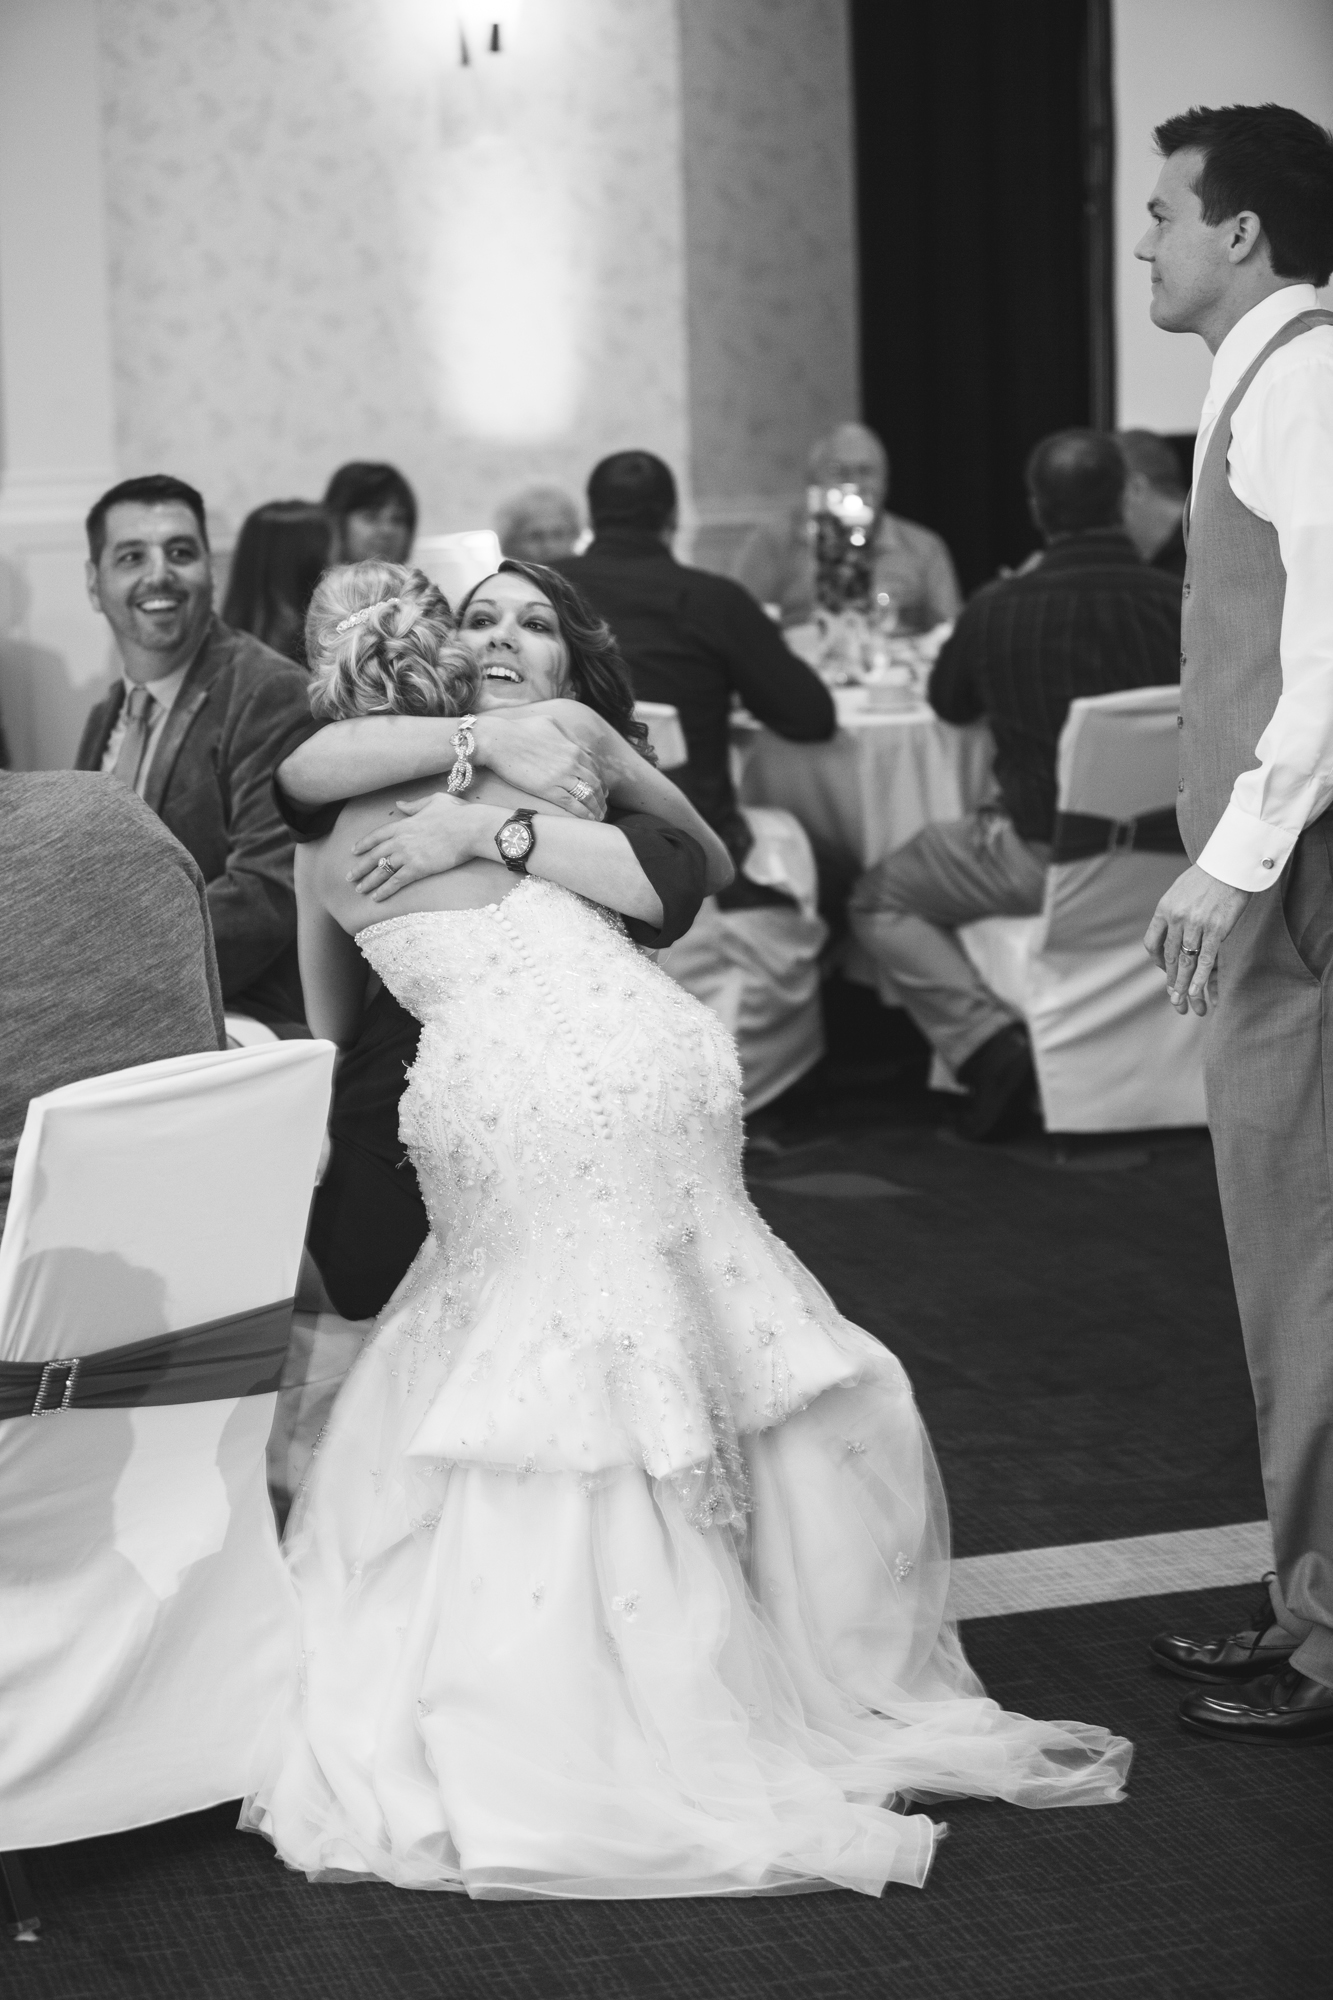 045_LH_MN_Wedding.jpg